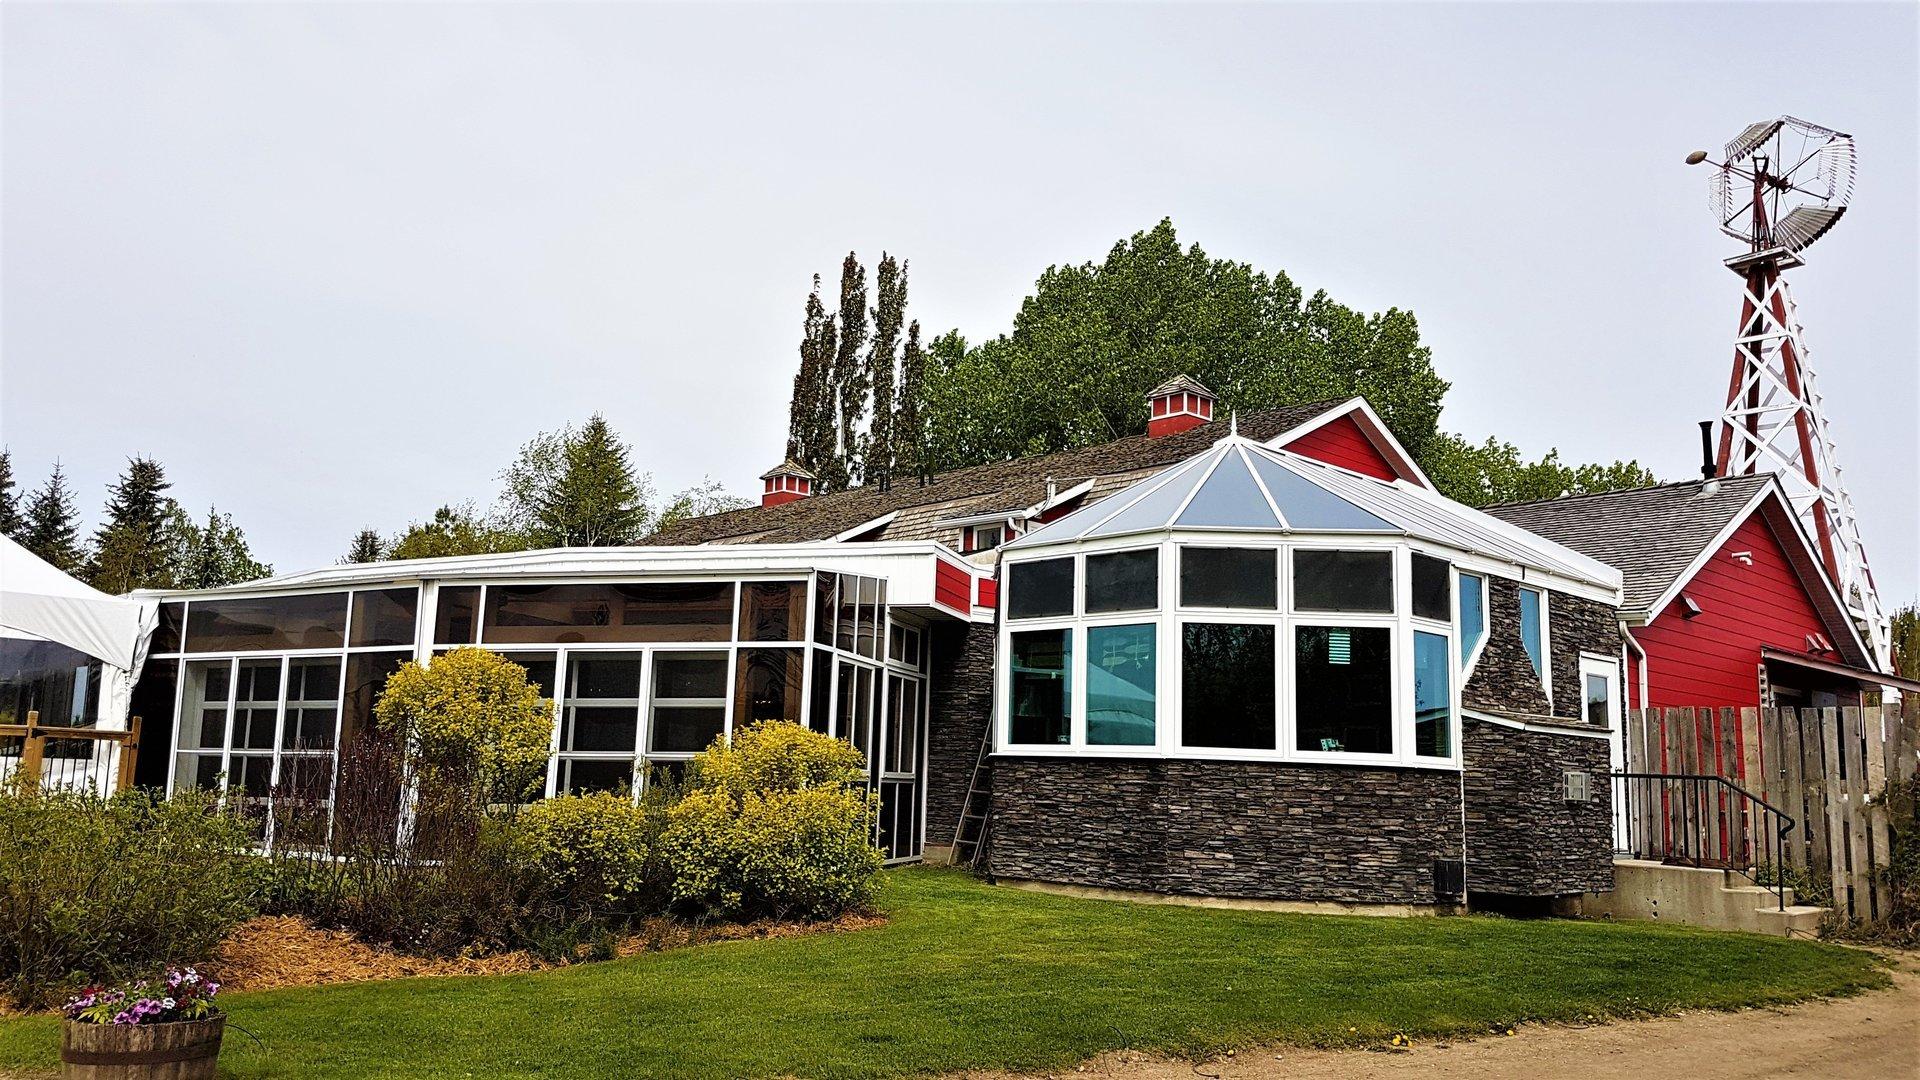 The Berry Barn exterior photo